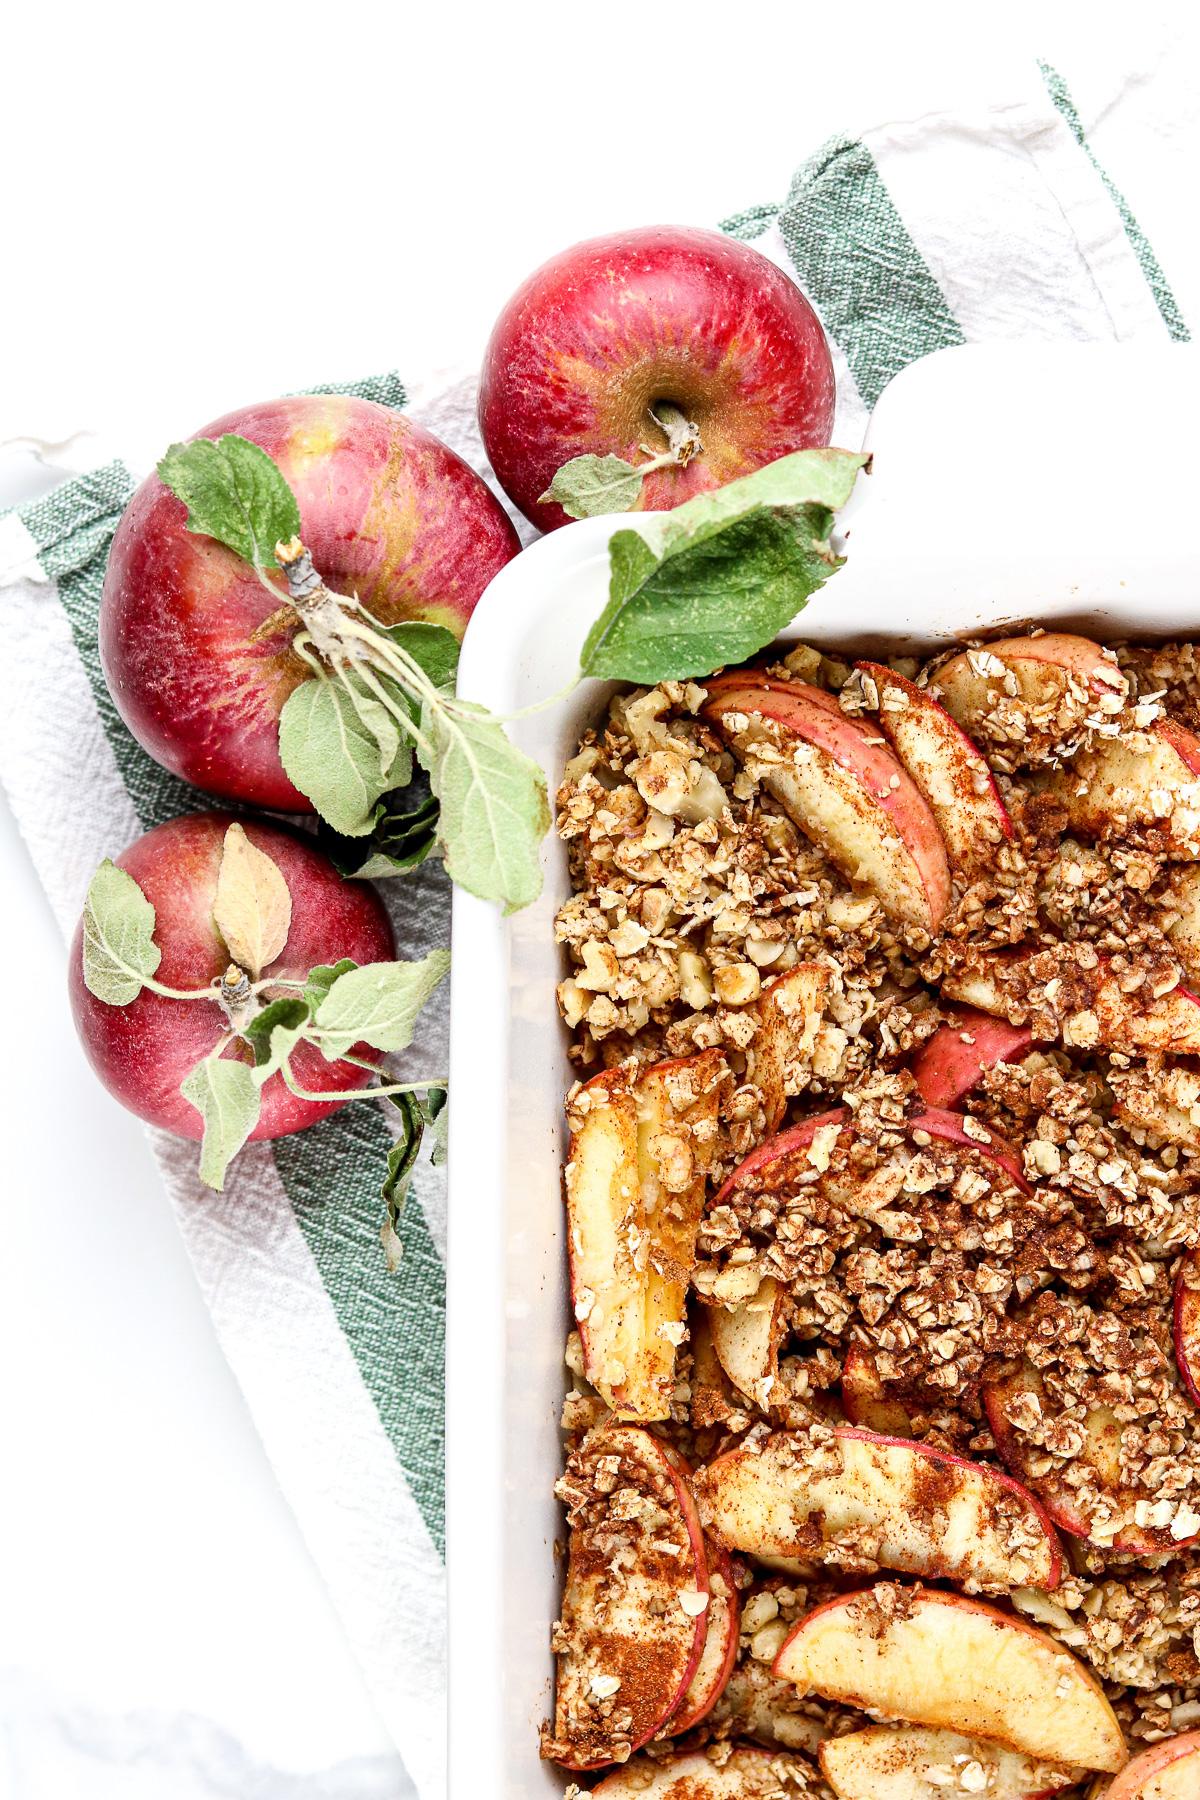 Image of cinnamon apple crisp with forks.